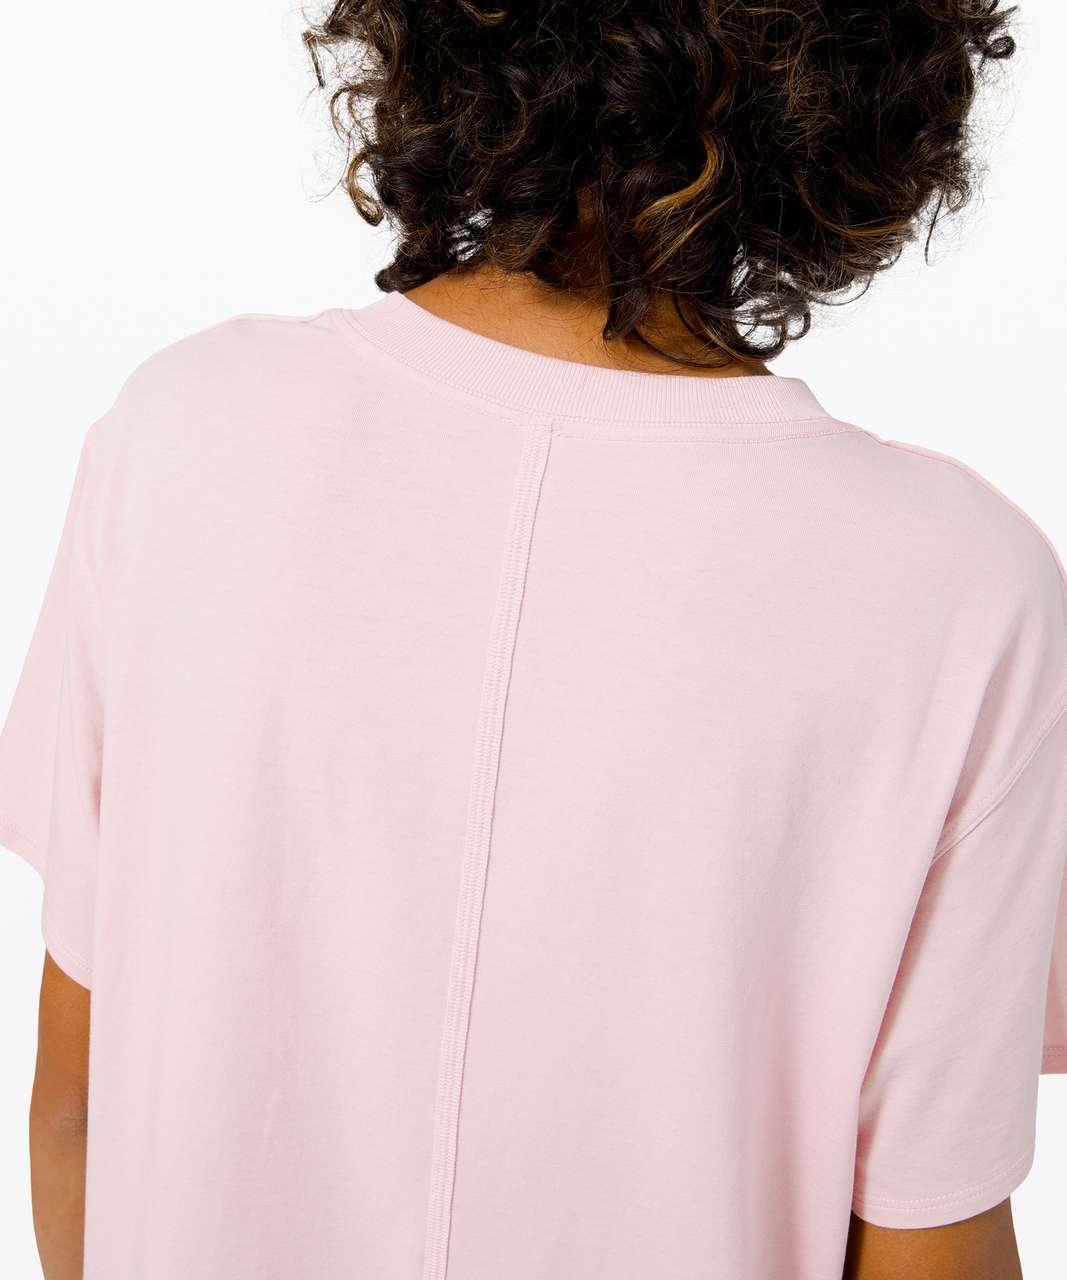 Lululemon All Yours Boyfriend Tee - Porcelain Pink